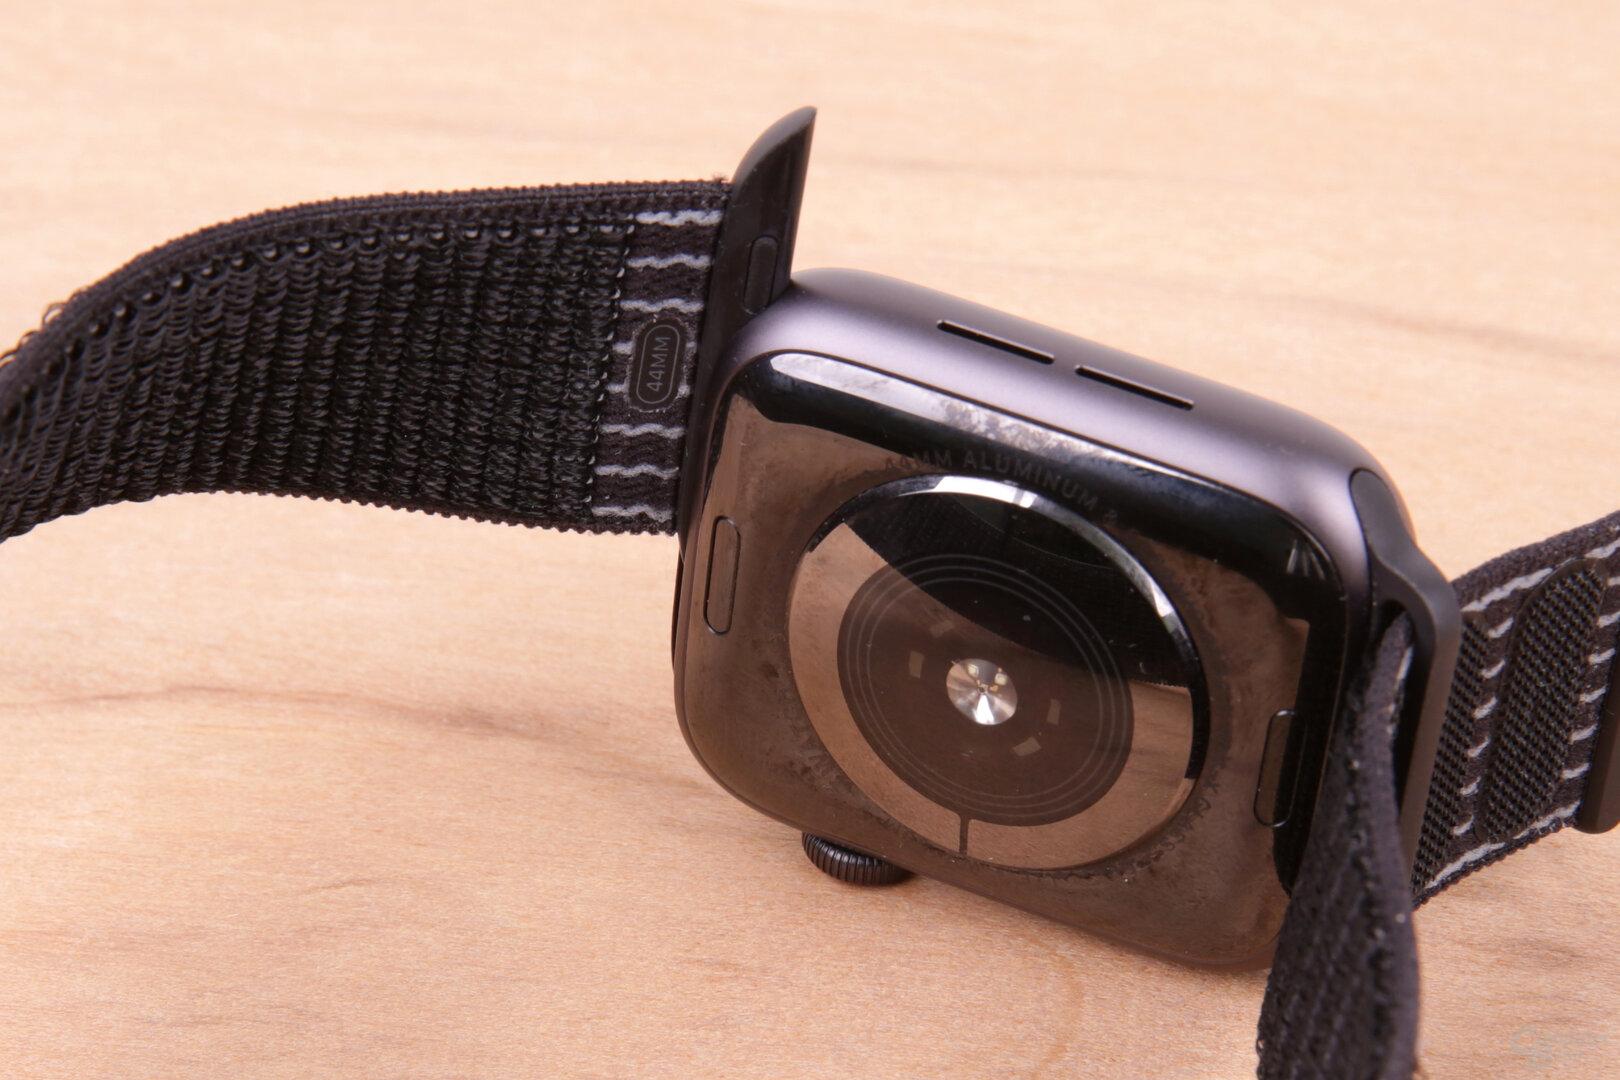 Sport Loop Armband der getesteten Nike-Variante